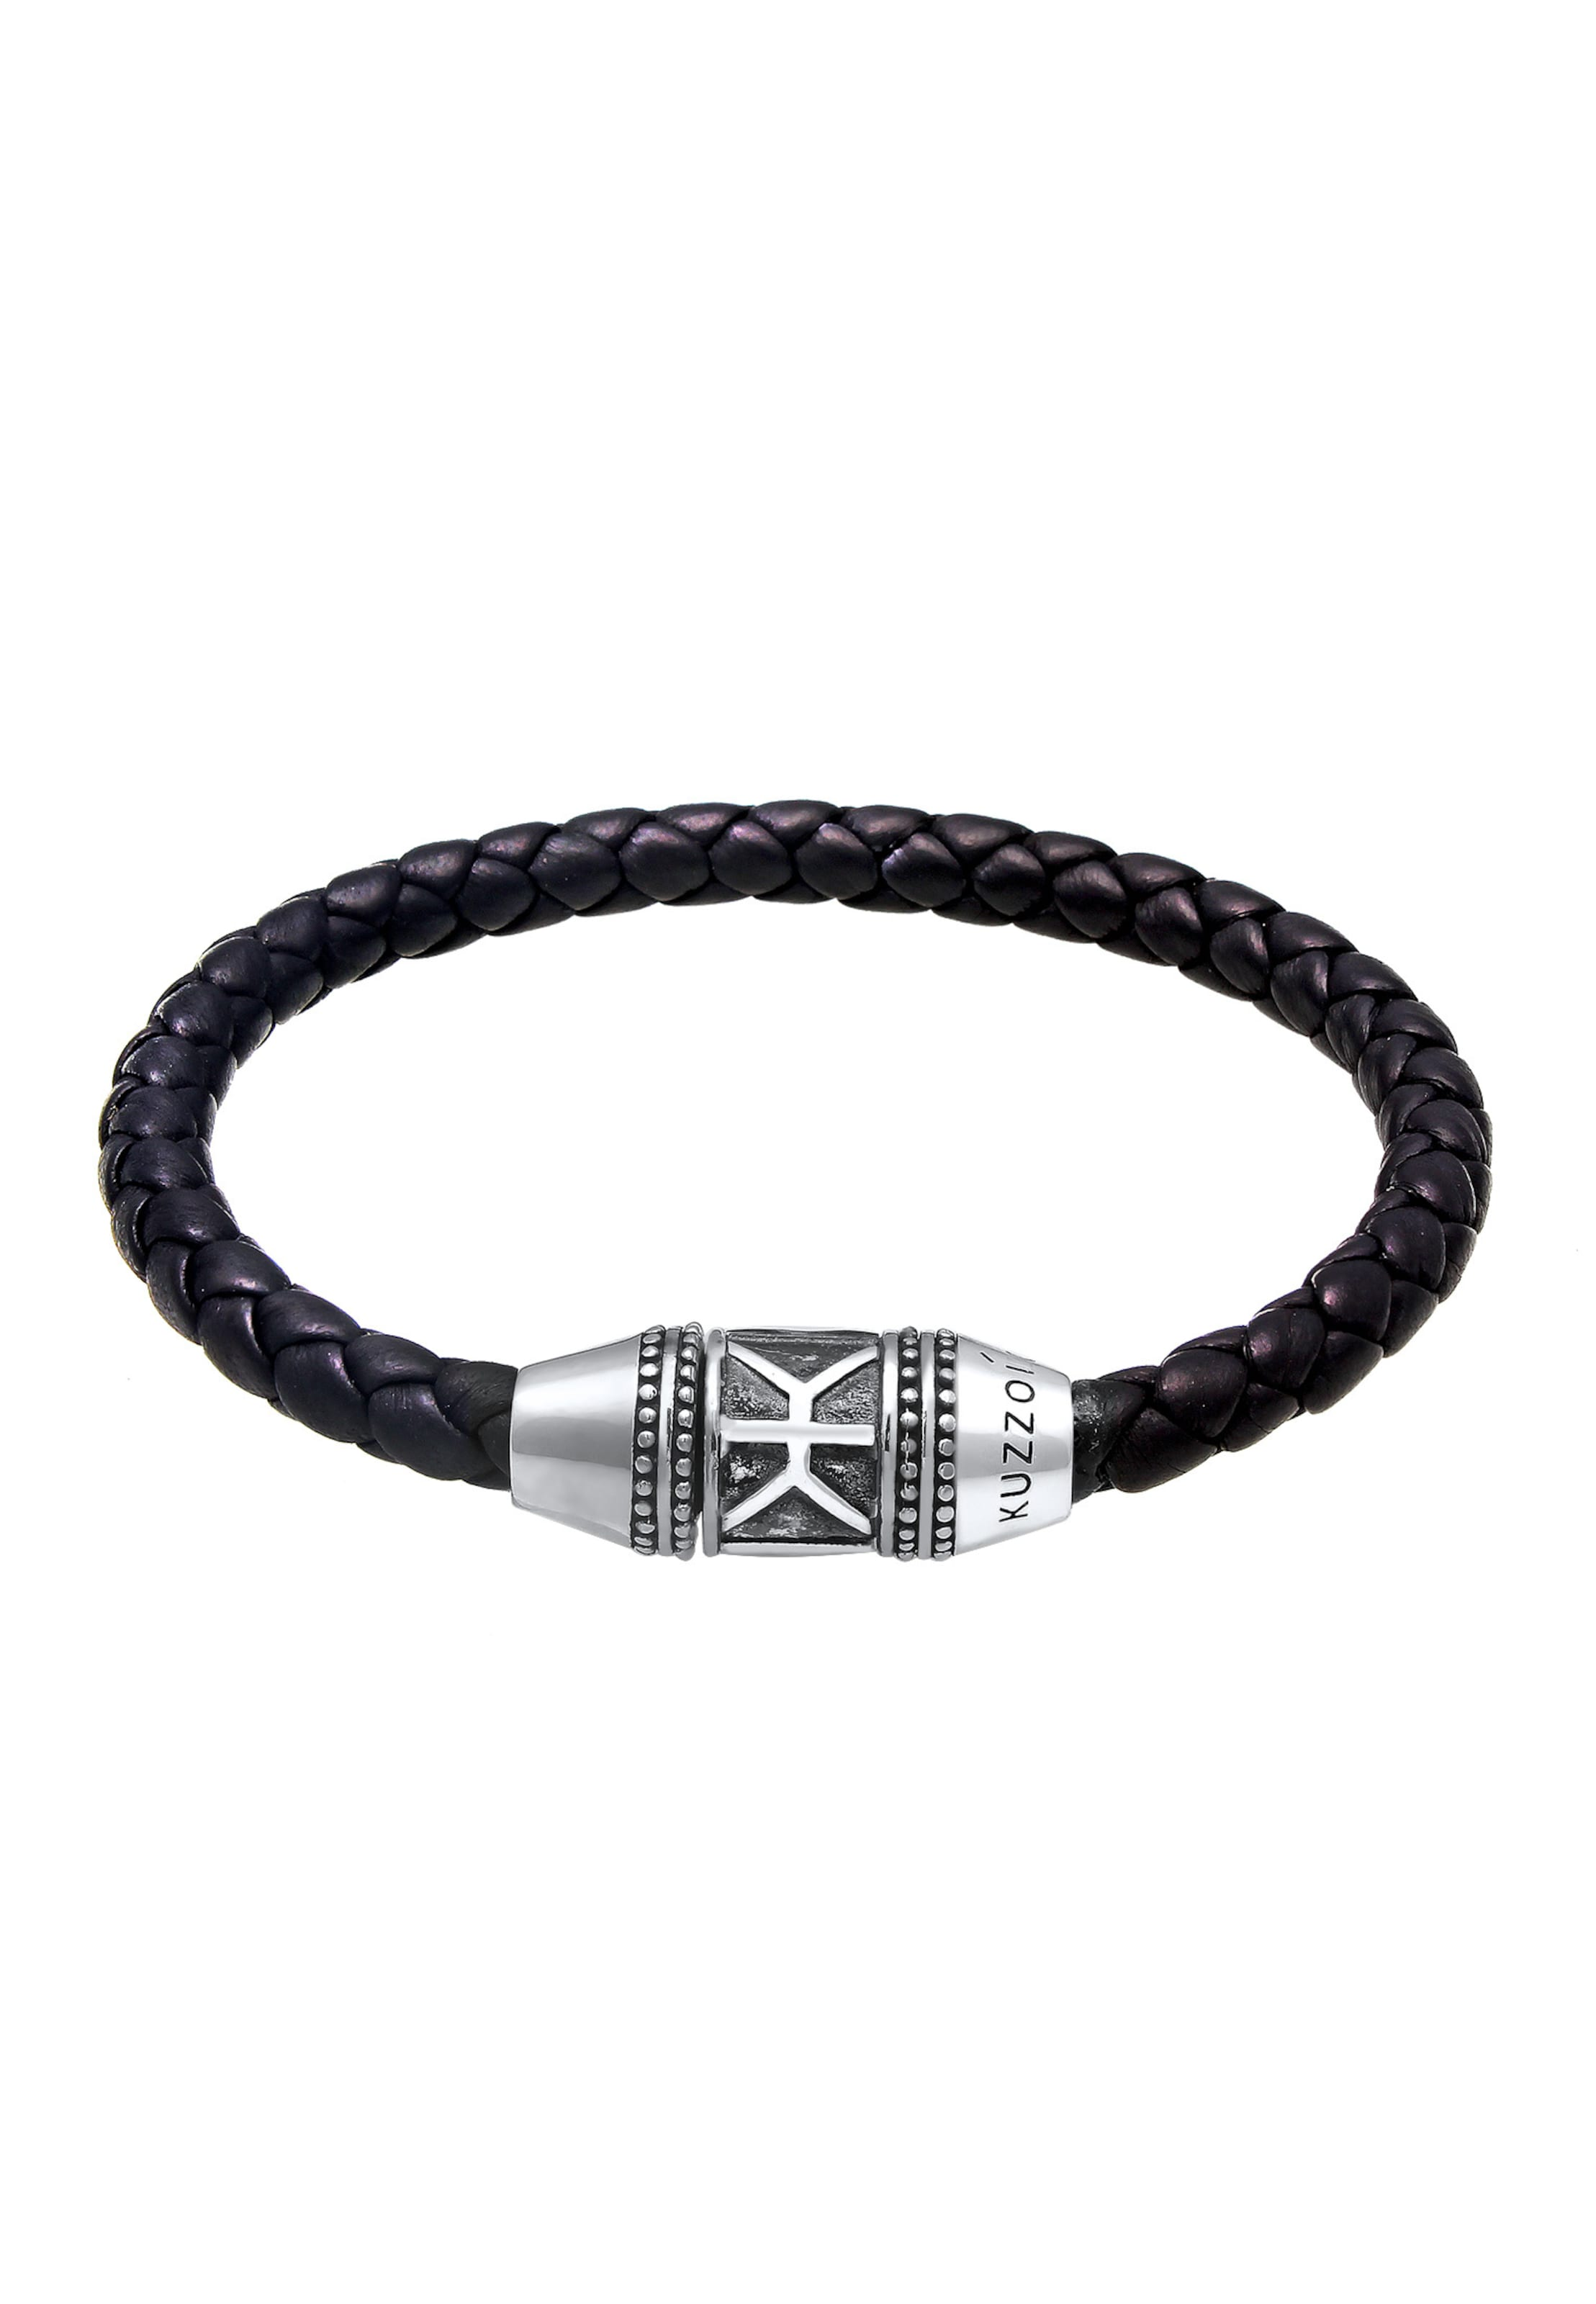 SchwarzSilber In In Kuzzoi Armband Kuzzoi Armband XZPiku